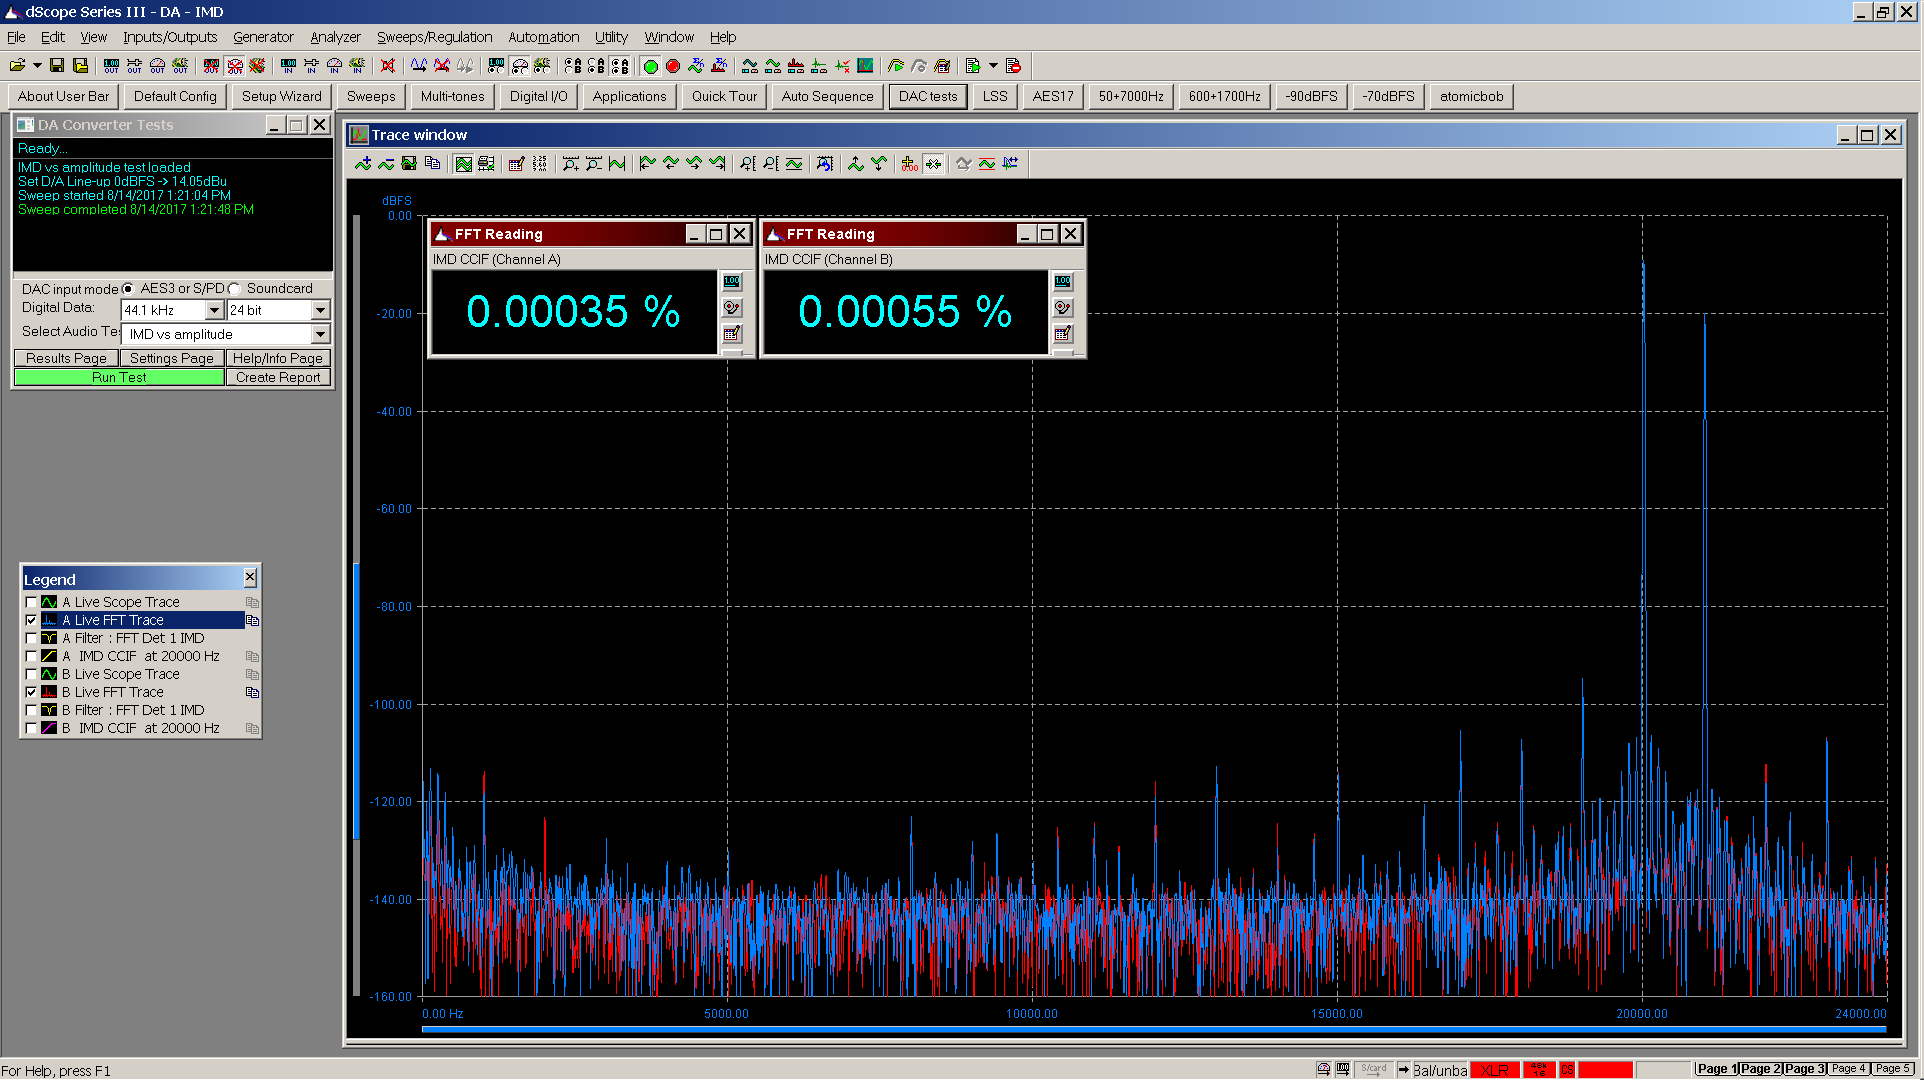 01 Bal IMD spectrum - spdif.PNG